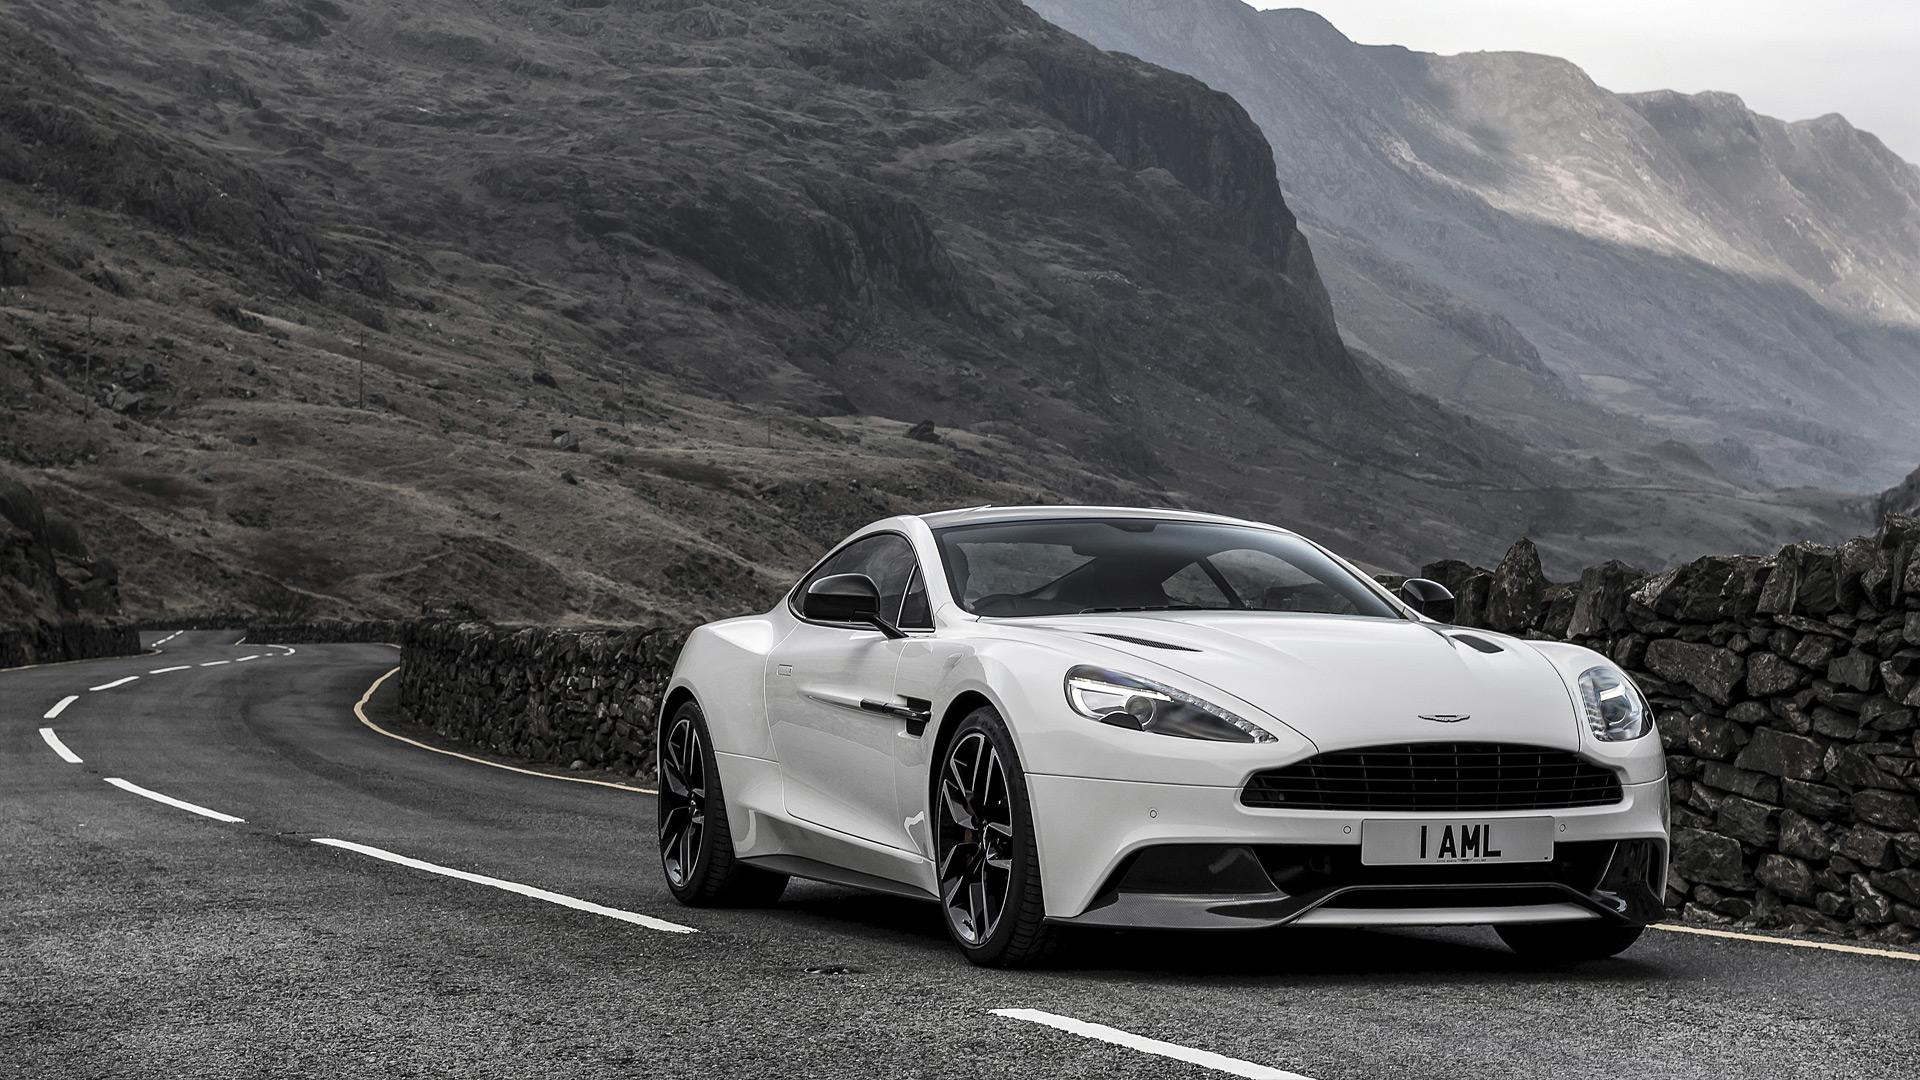 Aston Martin Vanquish Carbon White Edition Hd Wallpaper Hintergrund 1920x1080 Id 1056456 Wallpaper Abyss